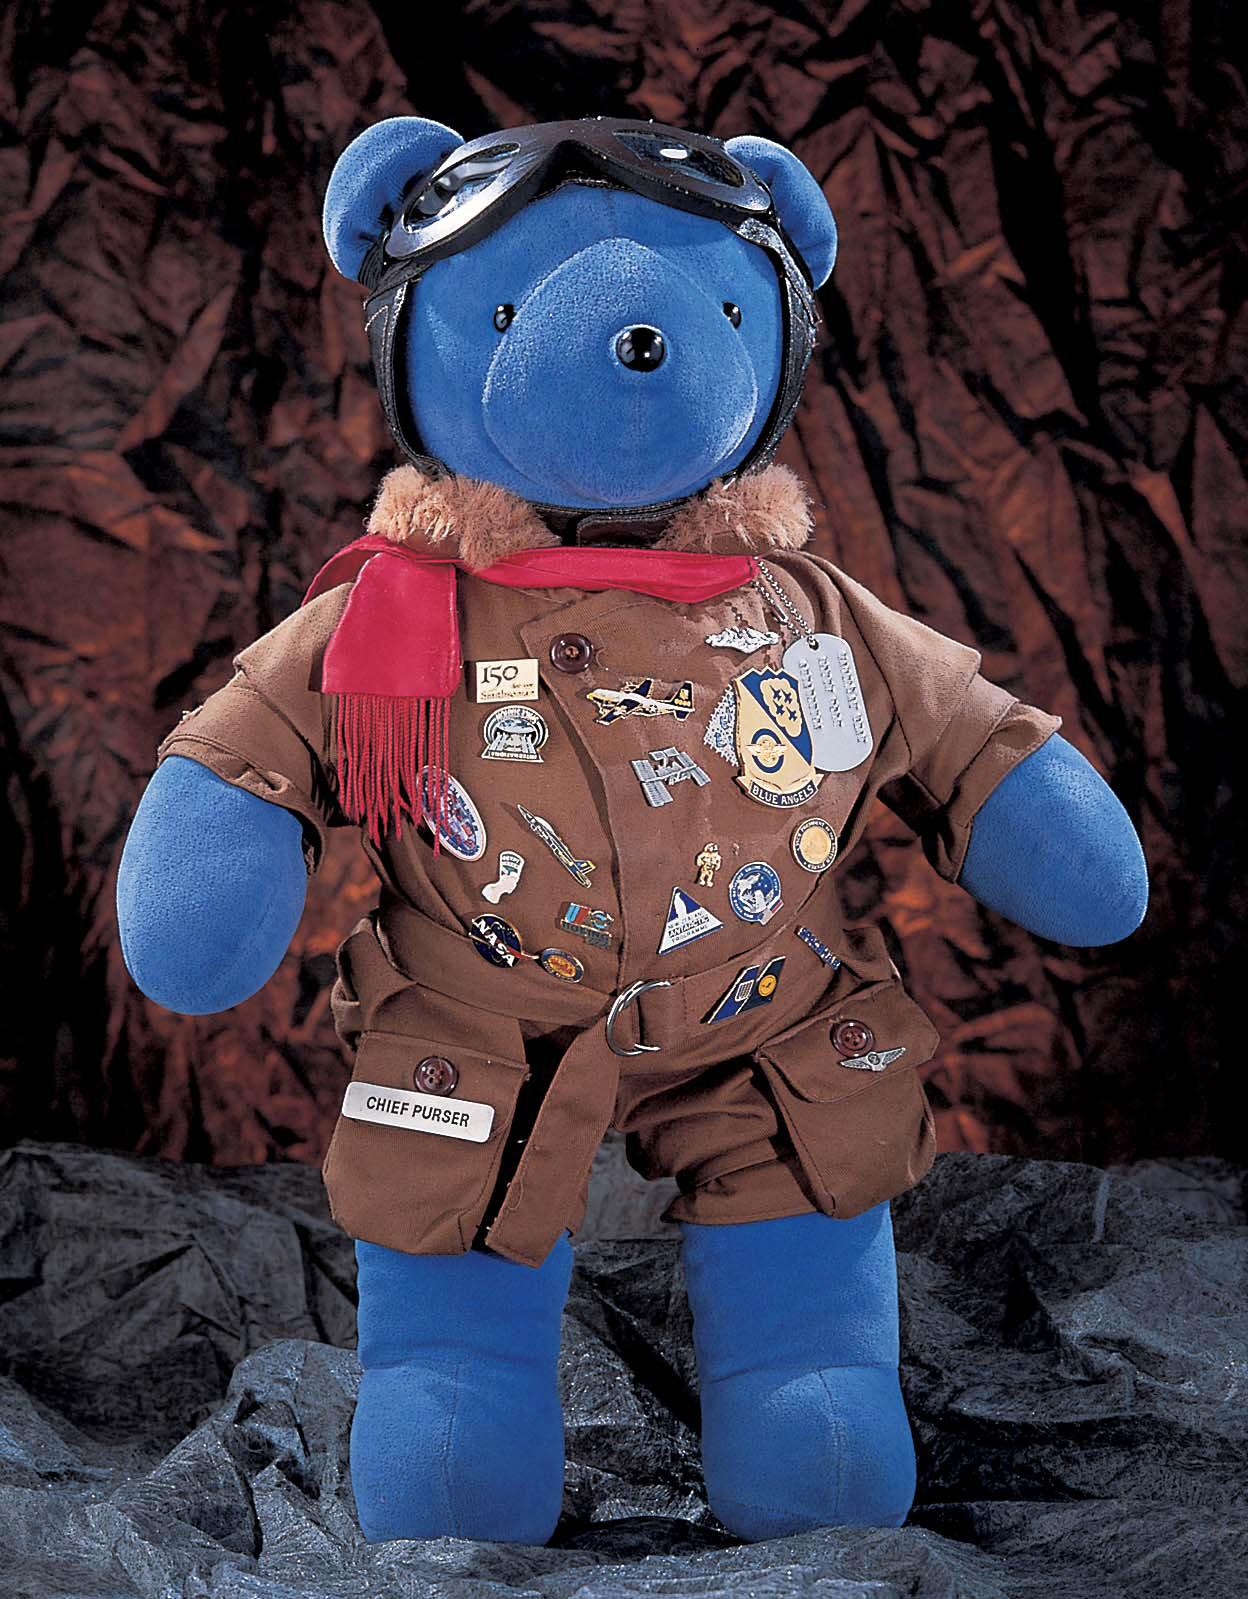 Image of : Toy, Stuffed, Teddy Bear (Magellan T. Bear), STS-63